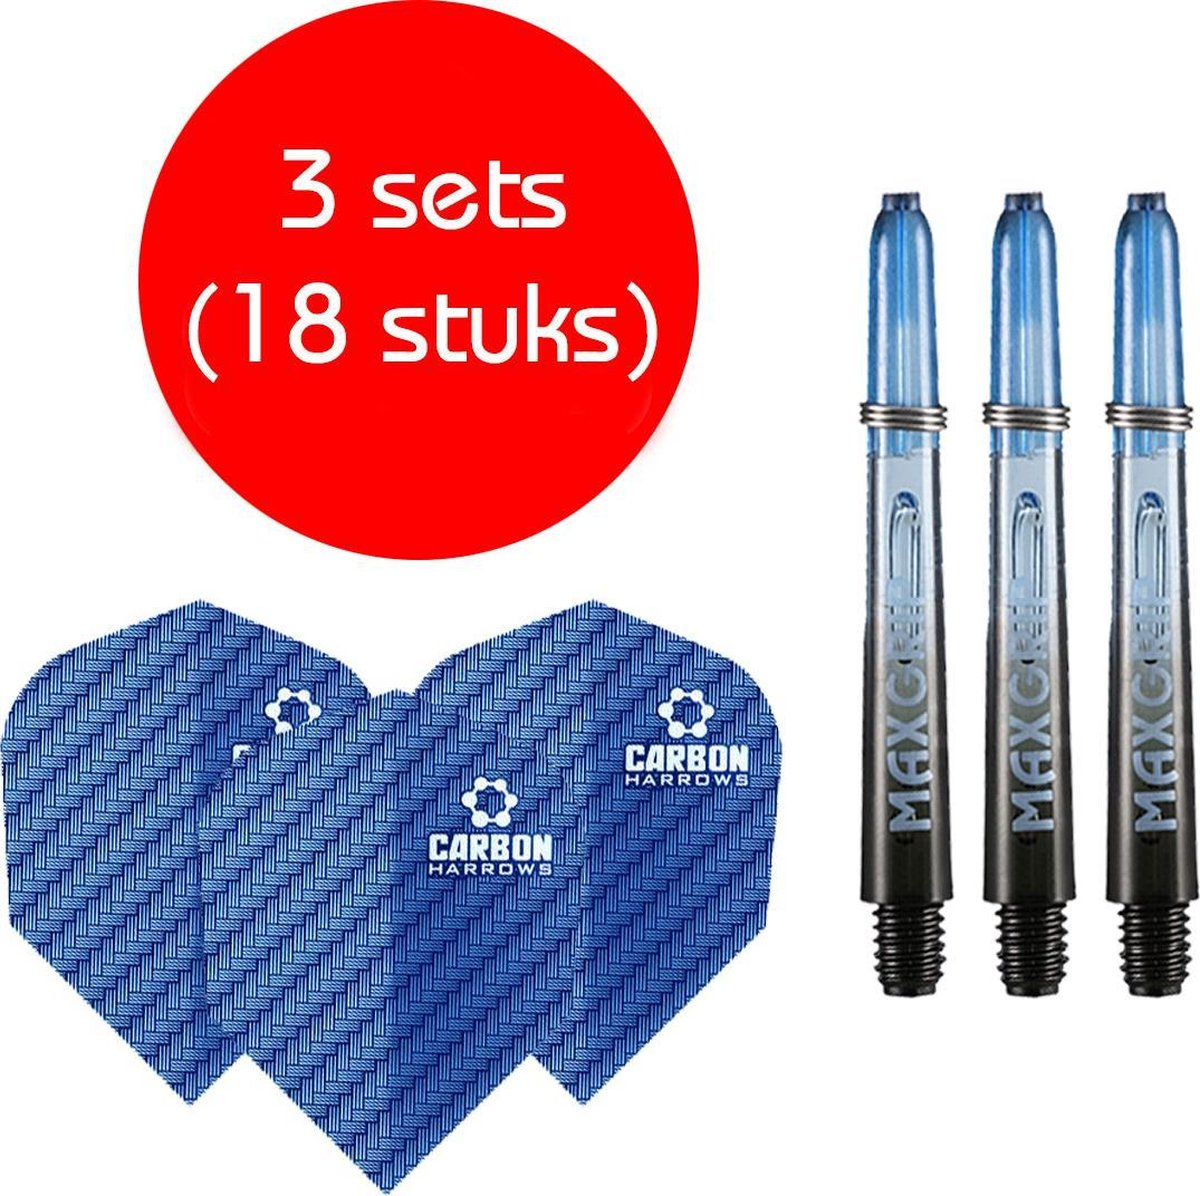 Dragon darts - Maxgrip - 3 sets - darts shafts - zwart-blauw - inbetween - en 3 sets - Carbon blauw - darts flights